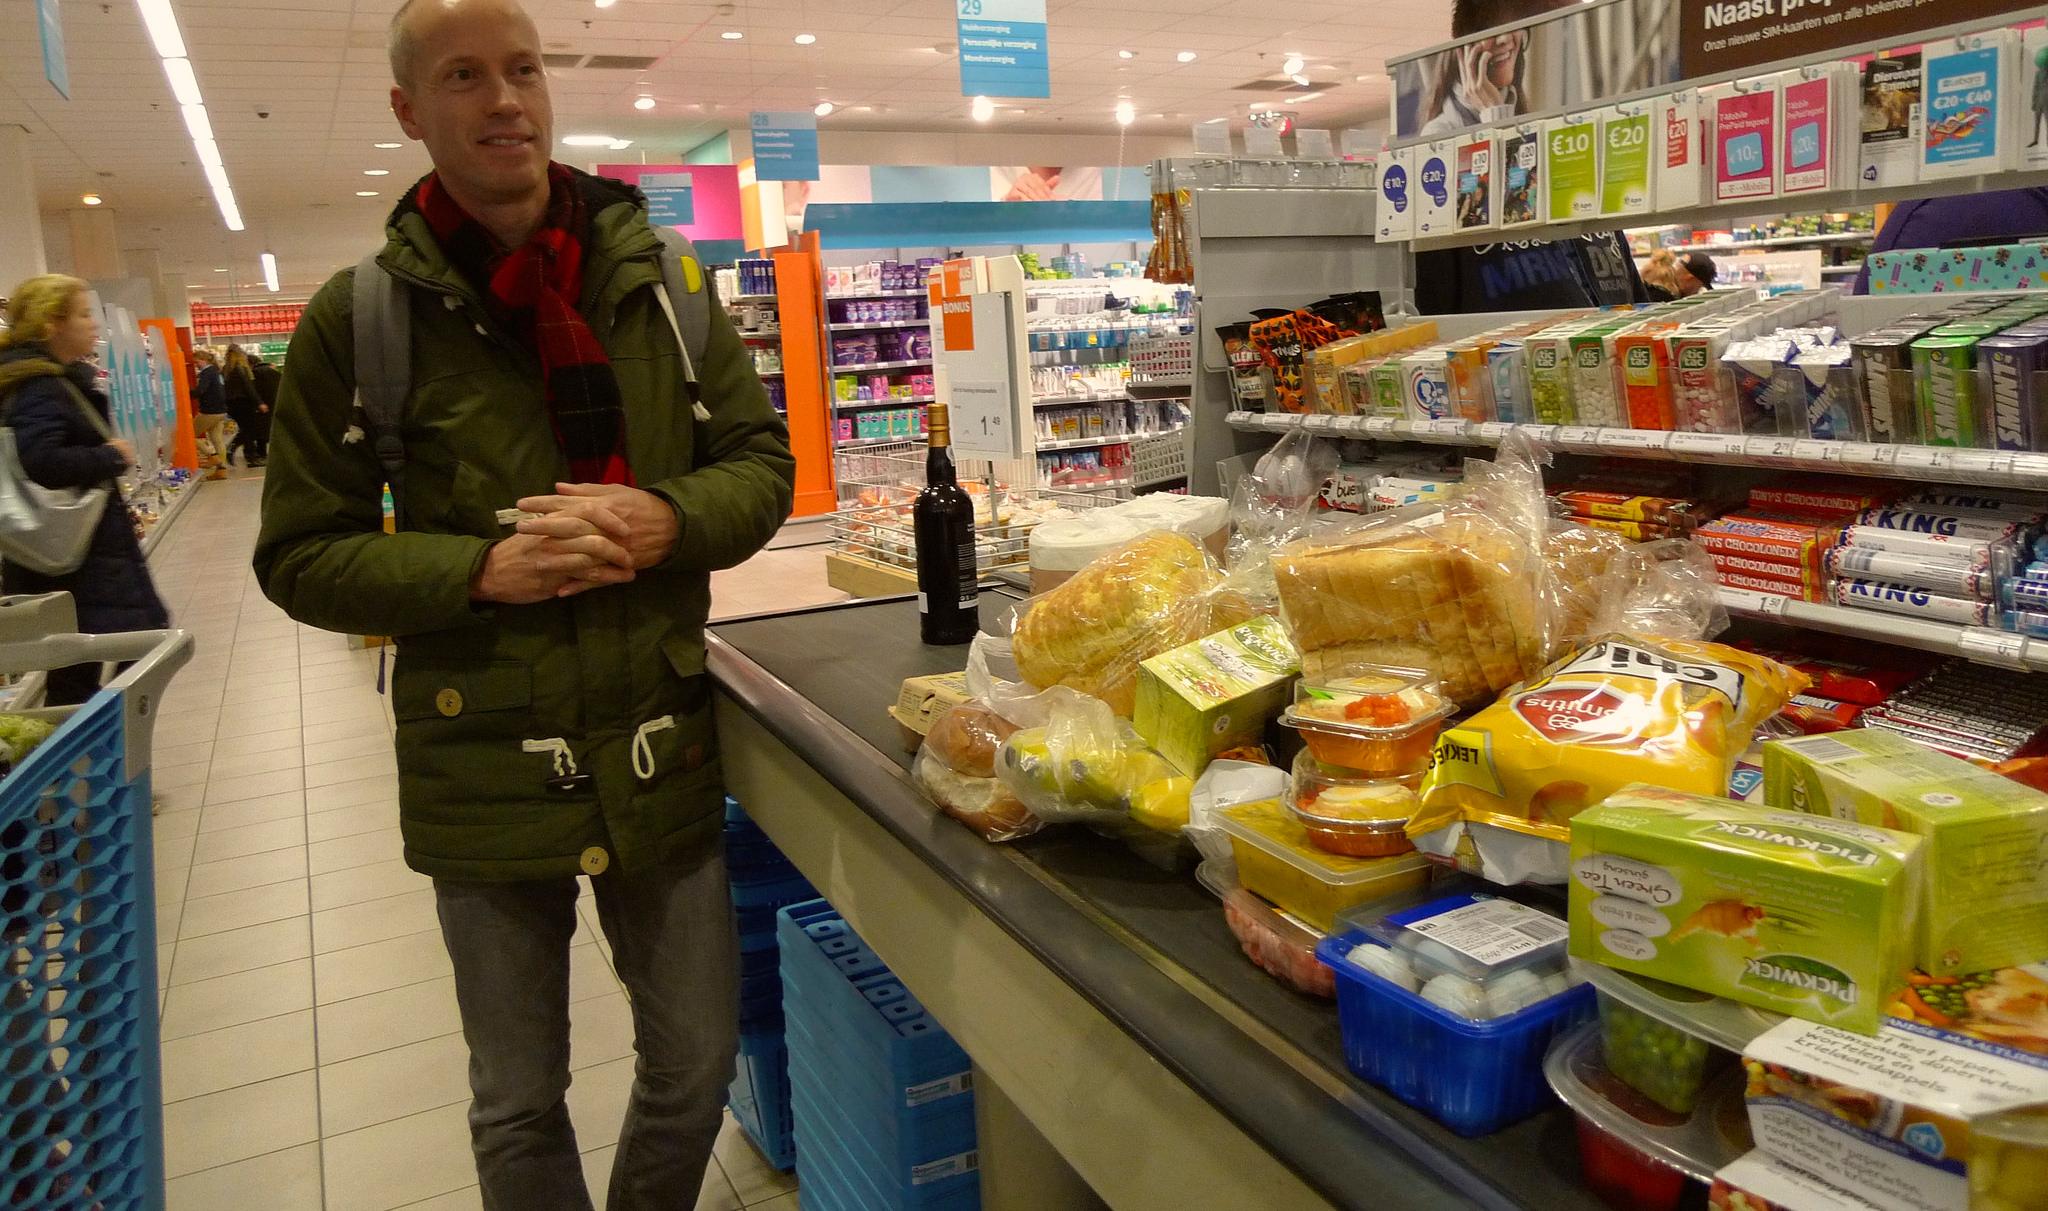 supermarkt-boodschappen-kassa-albert-heijn-hq-flickr-franklin-heijnen-cc-by-sa-2-0